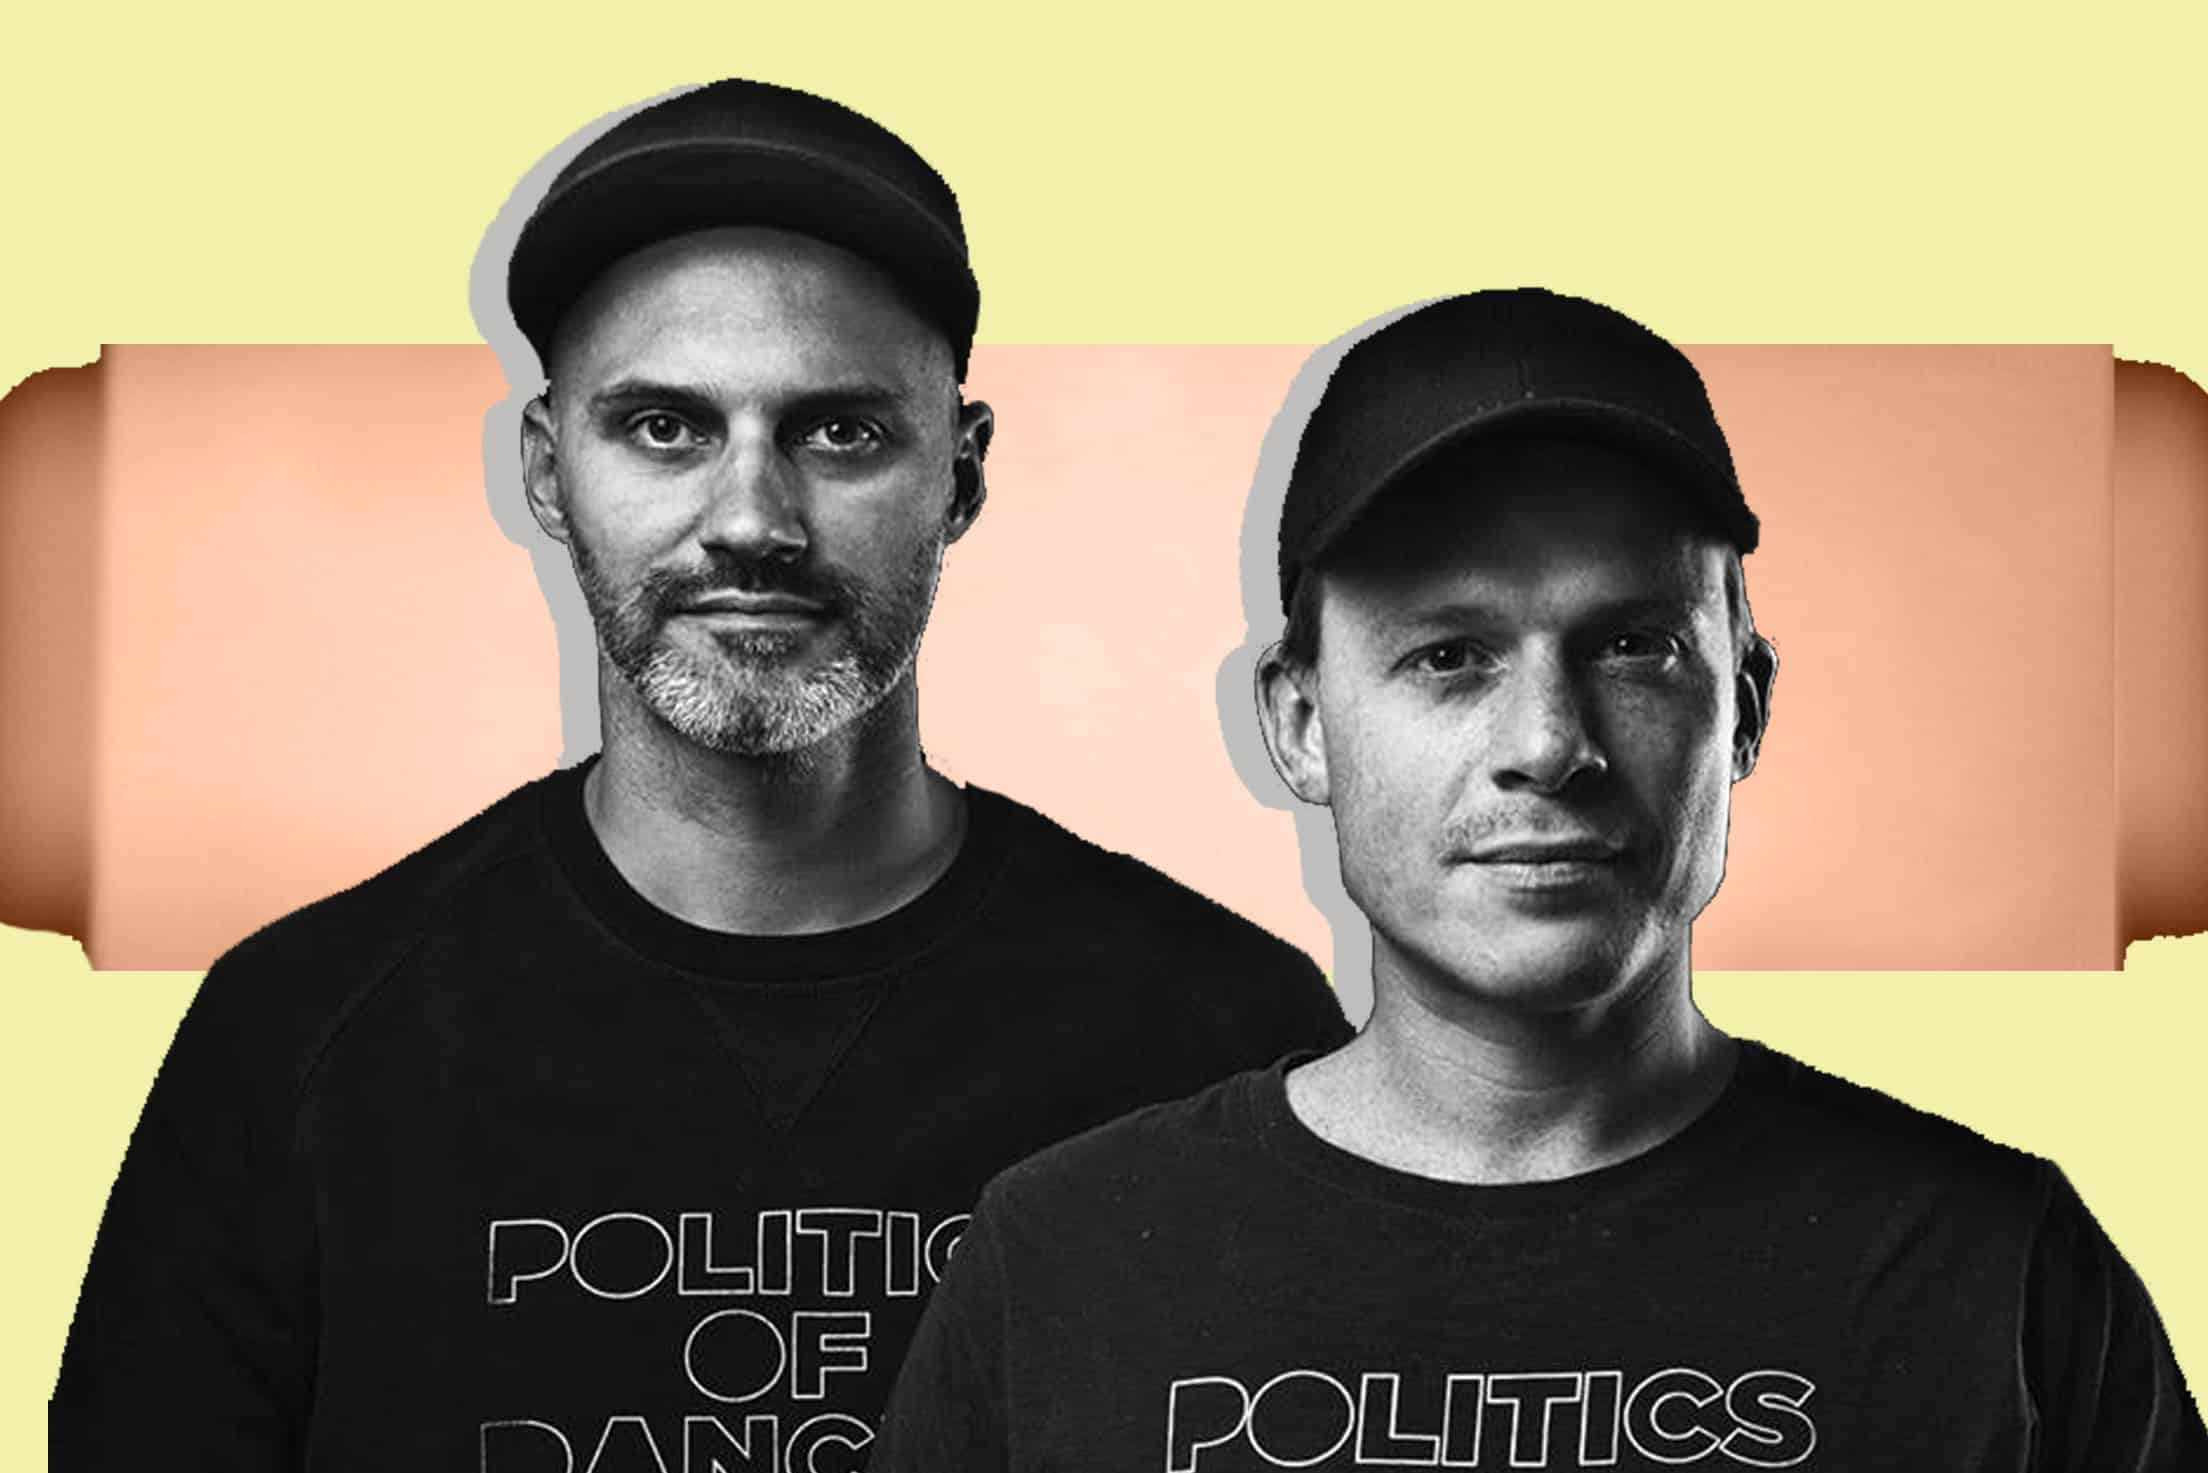 POLITICS OF DANCING – INNOVATIVE SELECTION